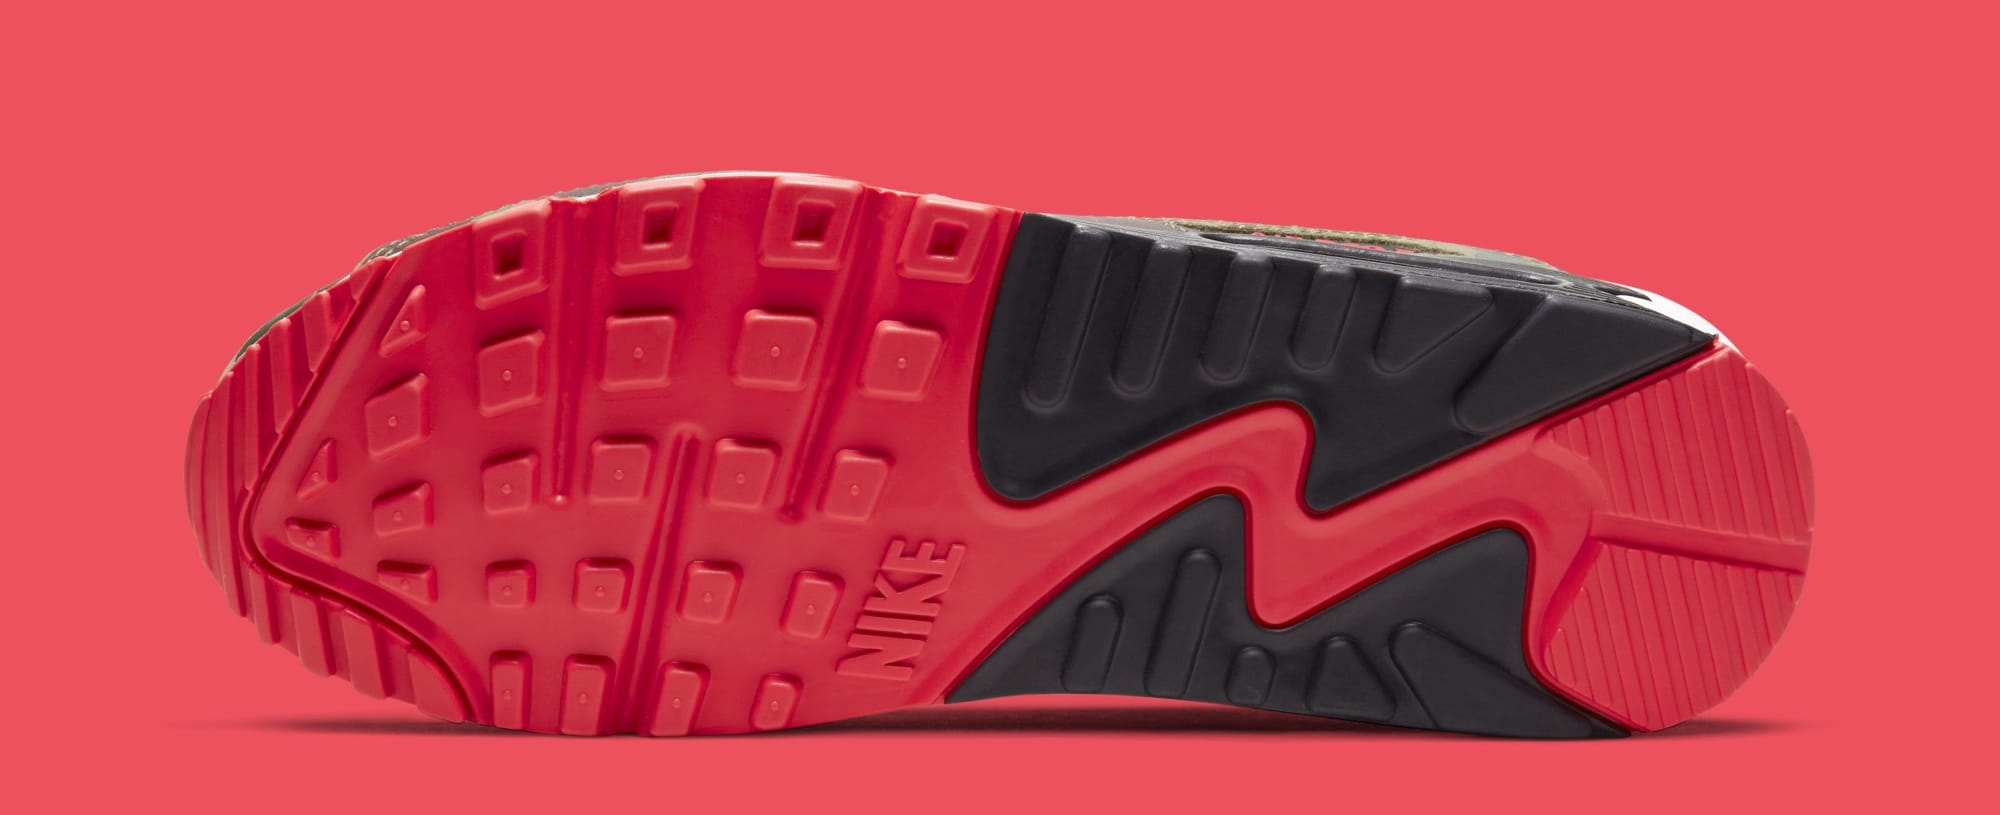 Nike Air Max 90 'Infrared Duck Camo' CW6024-600 (Sole)